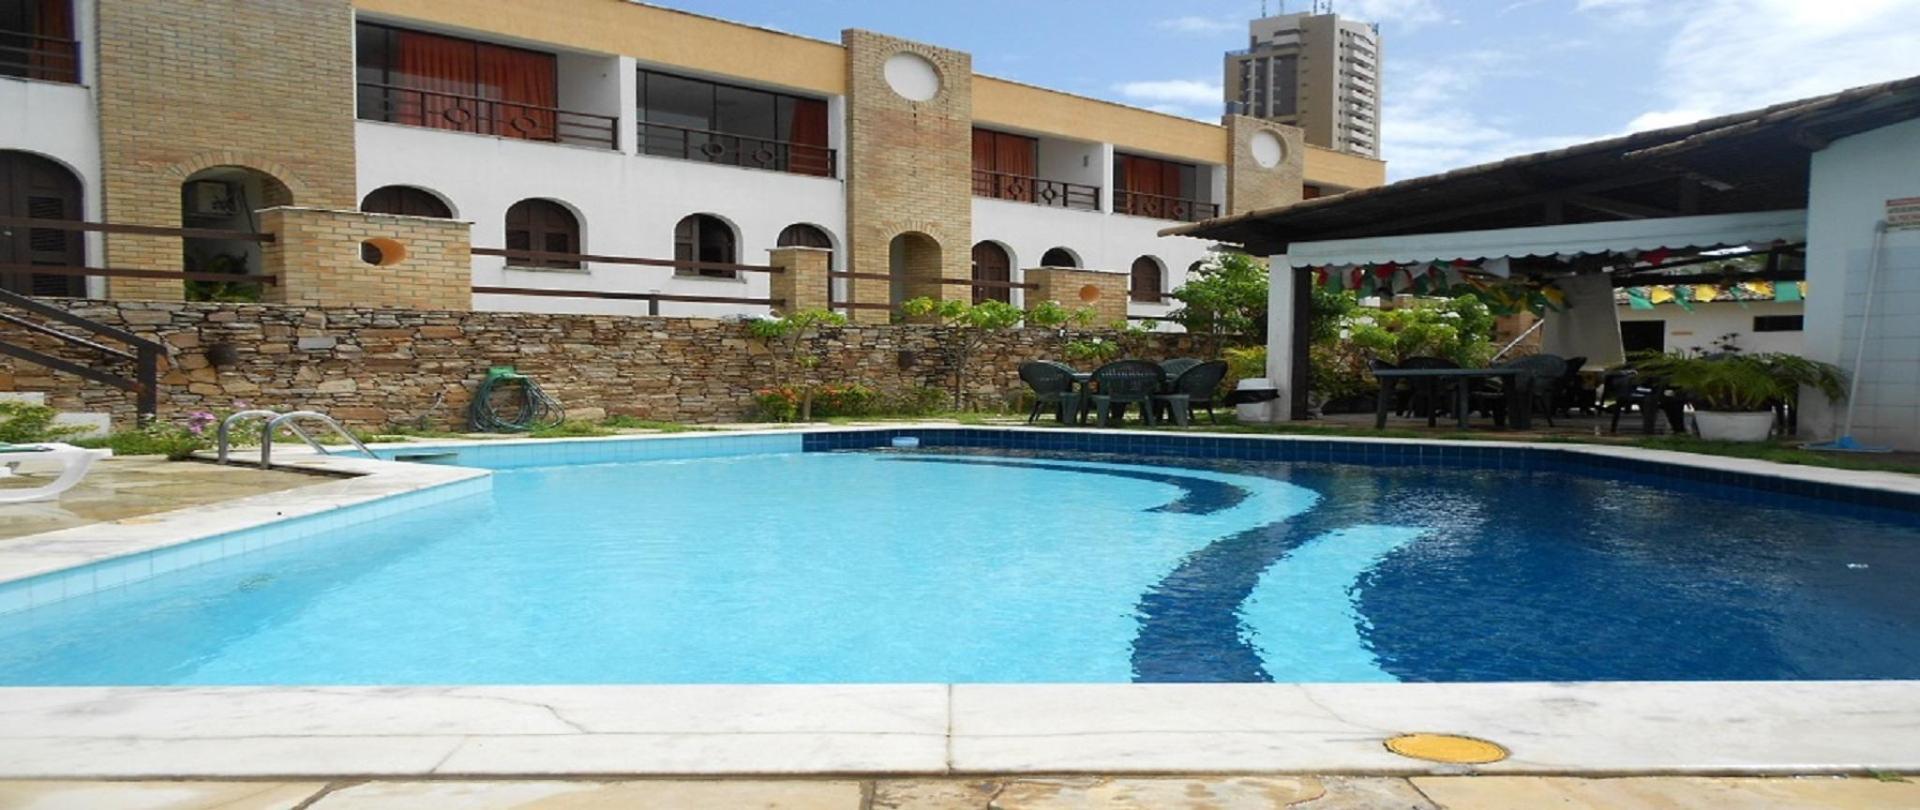 Ponta do Sol Hotel Flat  Piscina, Sauna ,Portaria 24 horas, Estacionamento Área laser